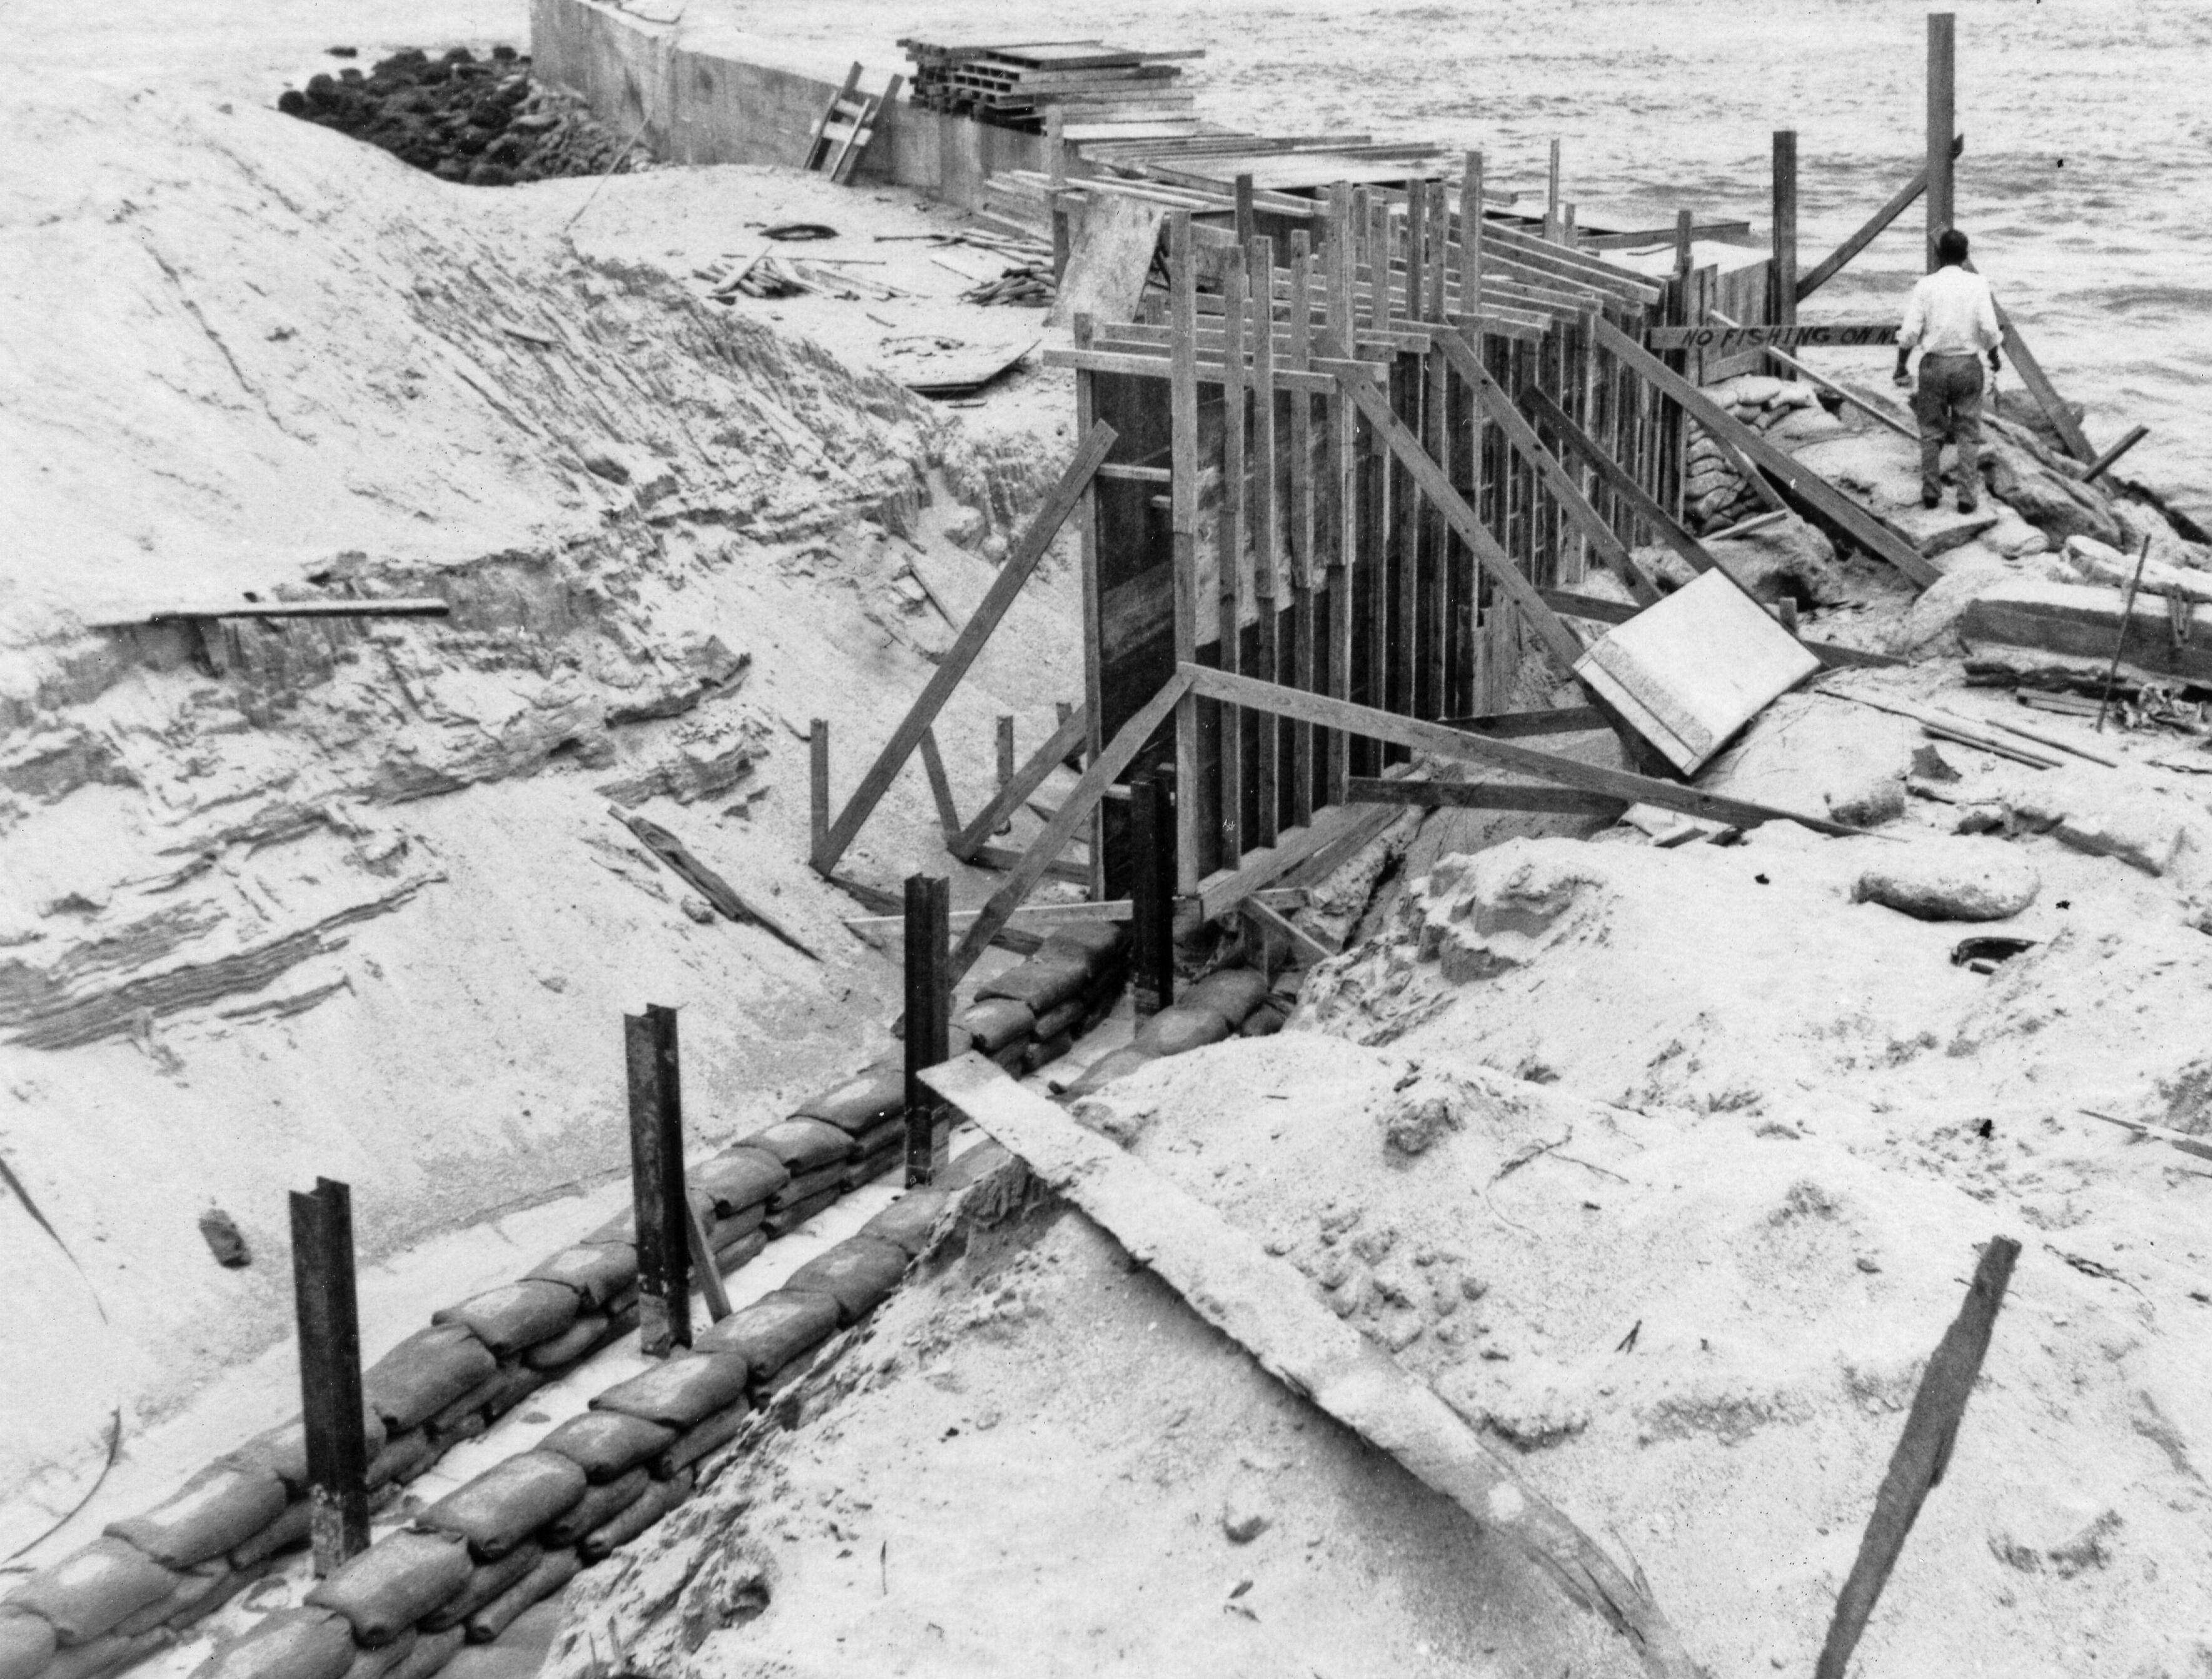 1958 jetty construction at Sebastian Inlet.